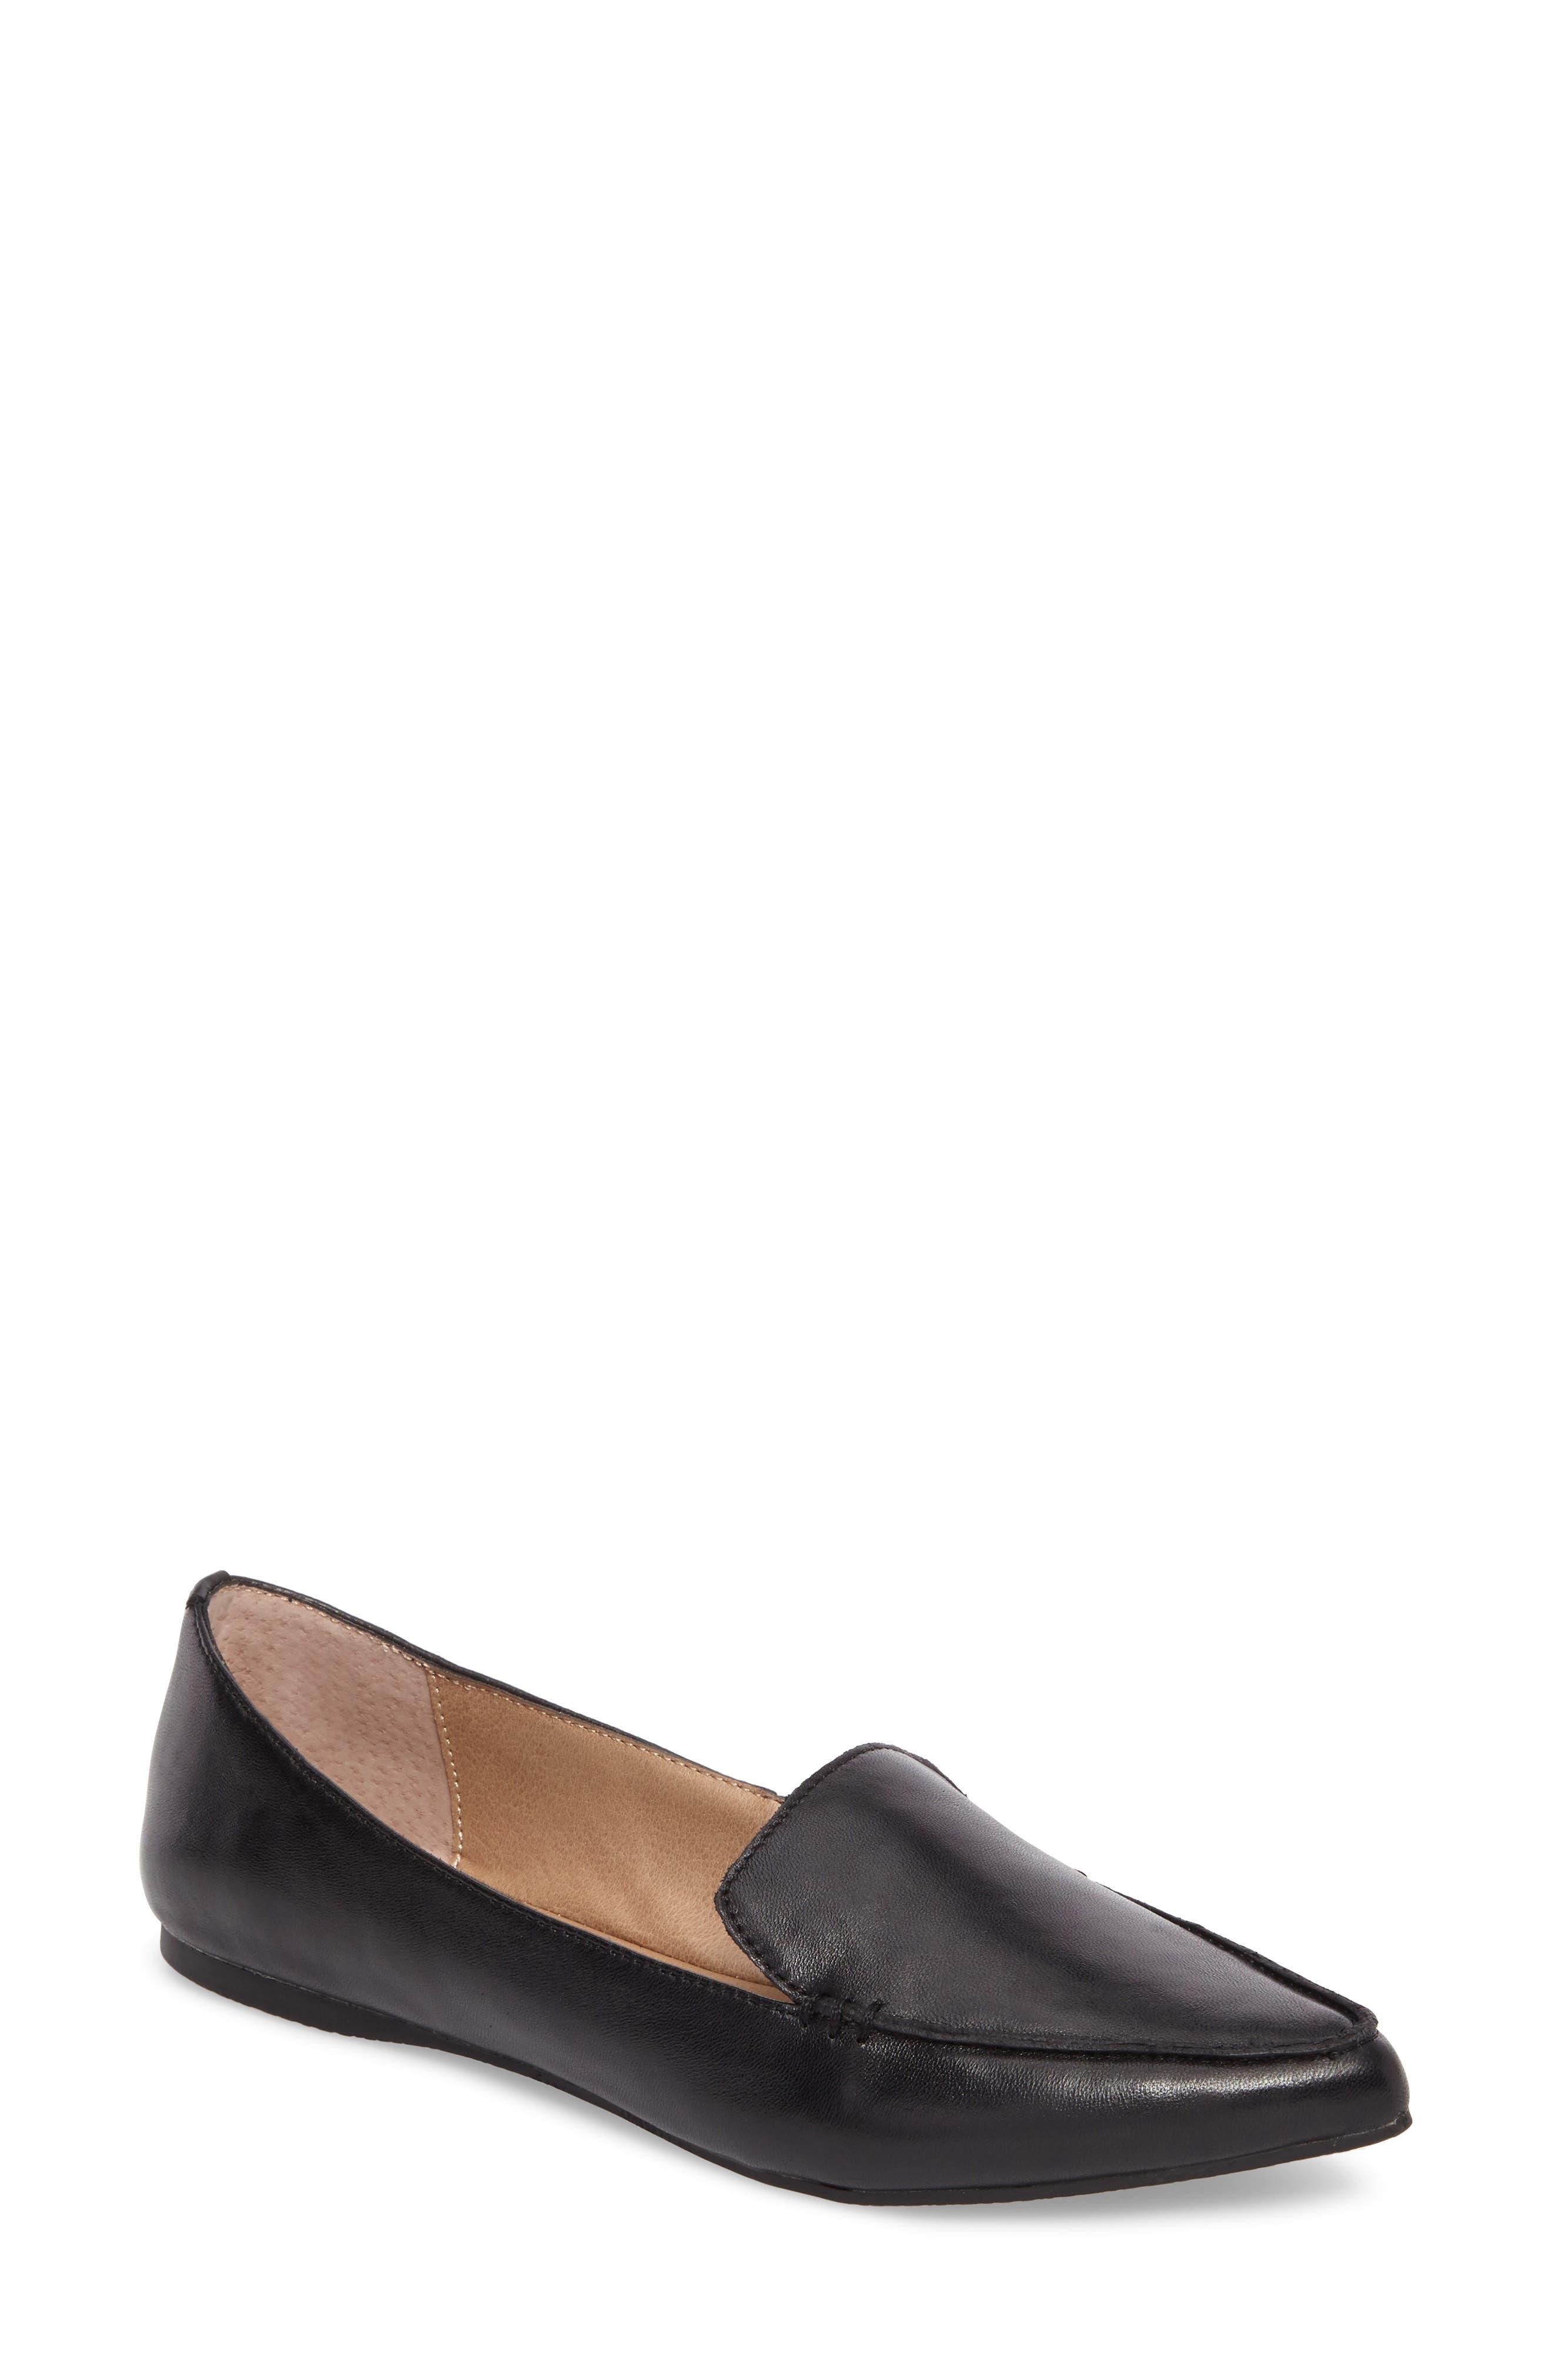 Women's Loafers \u0026 Oxfords   Nordstrom